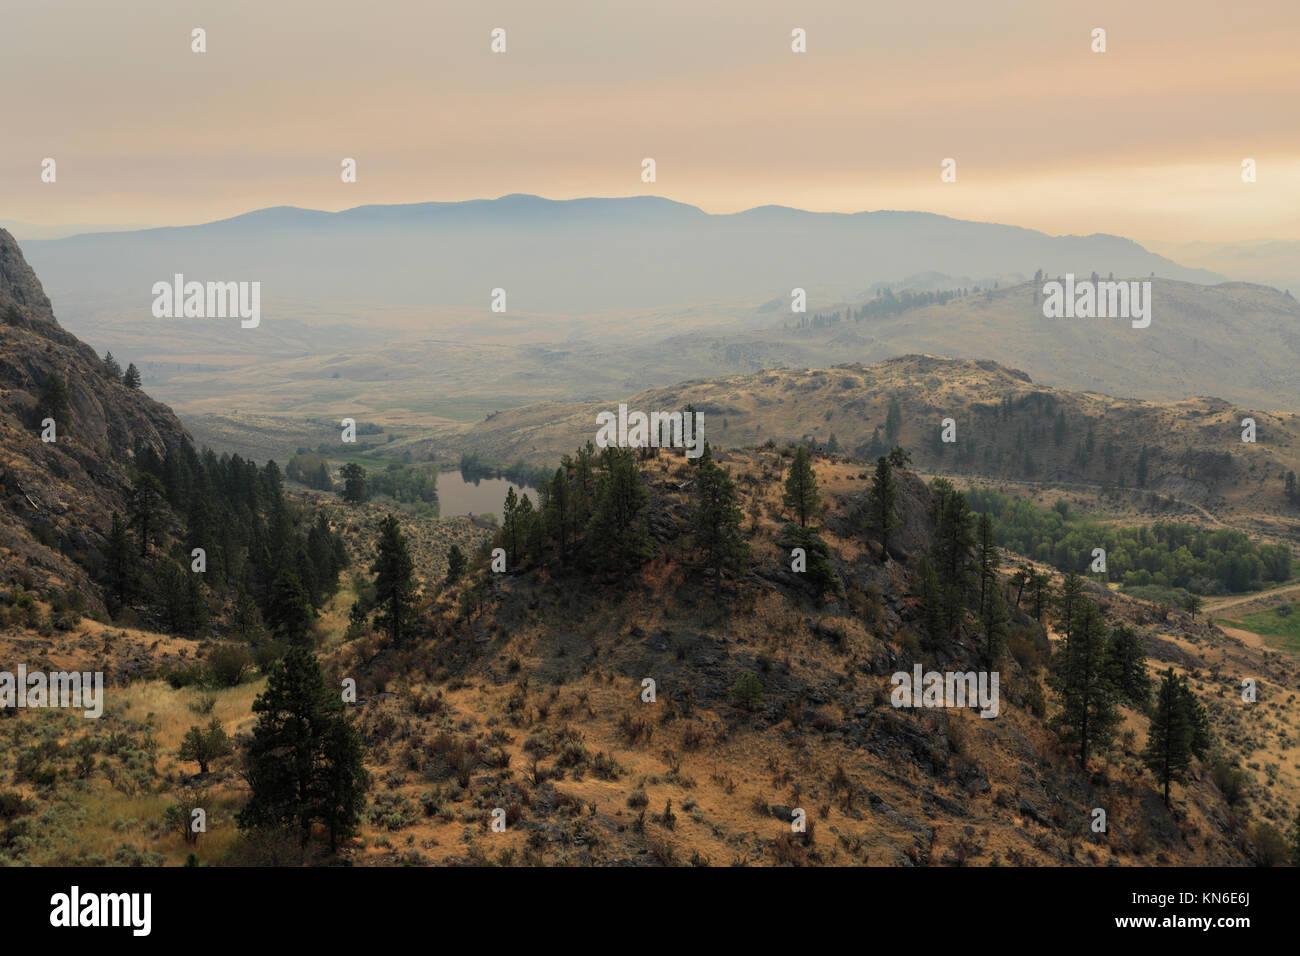 View of wild Fires smoke over Osoyoos lake, Osoyoos town, Okanagan valley, British Columbia, Canada. - Stock Image